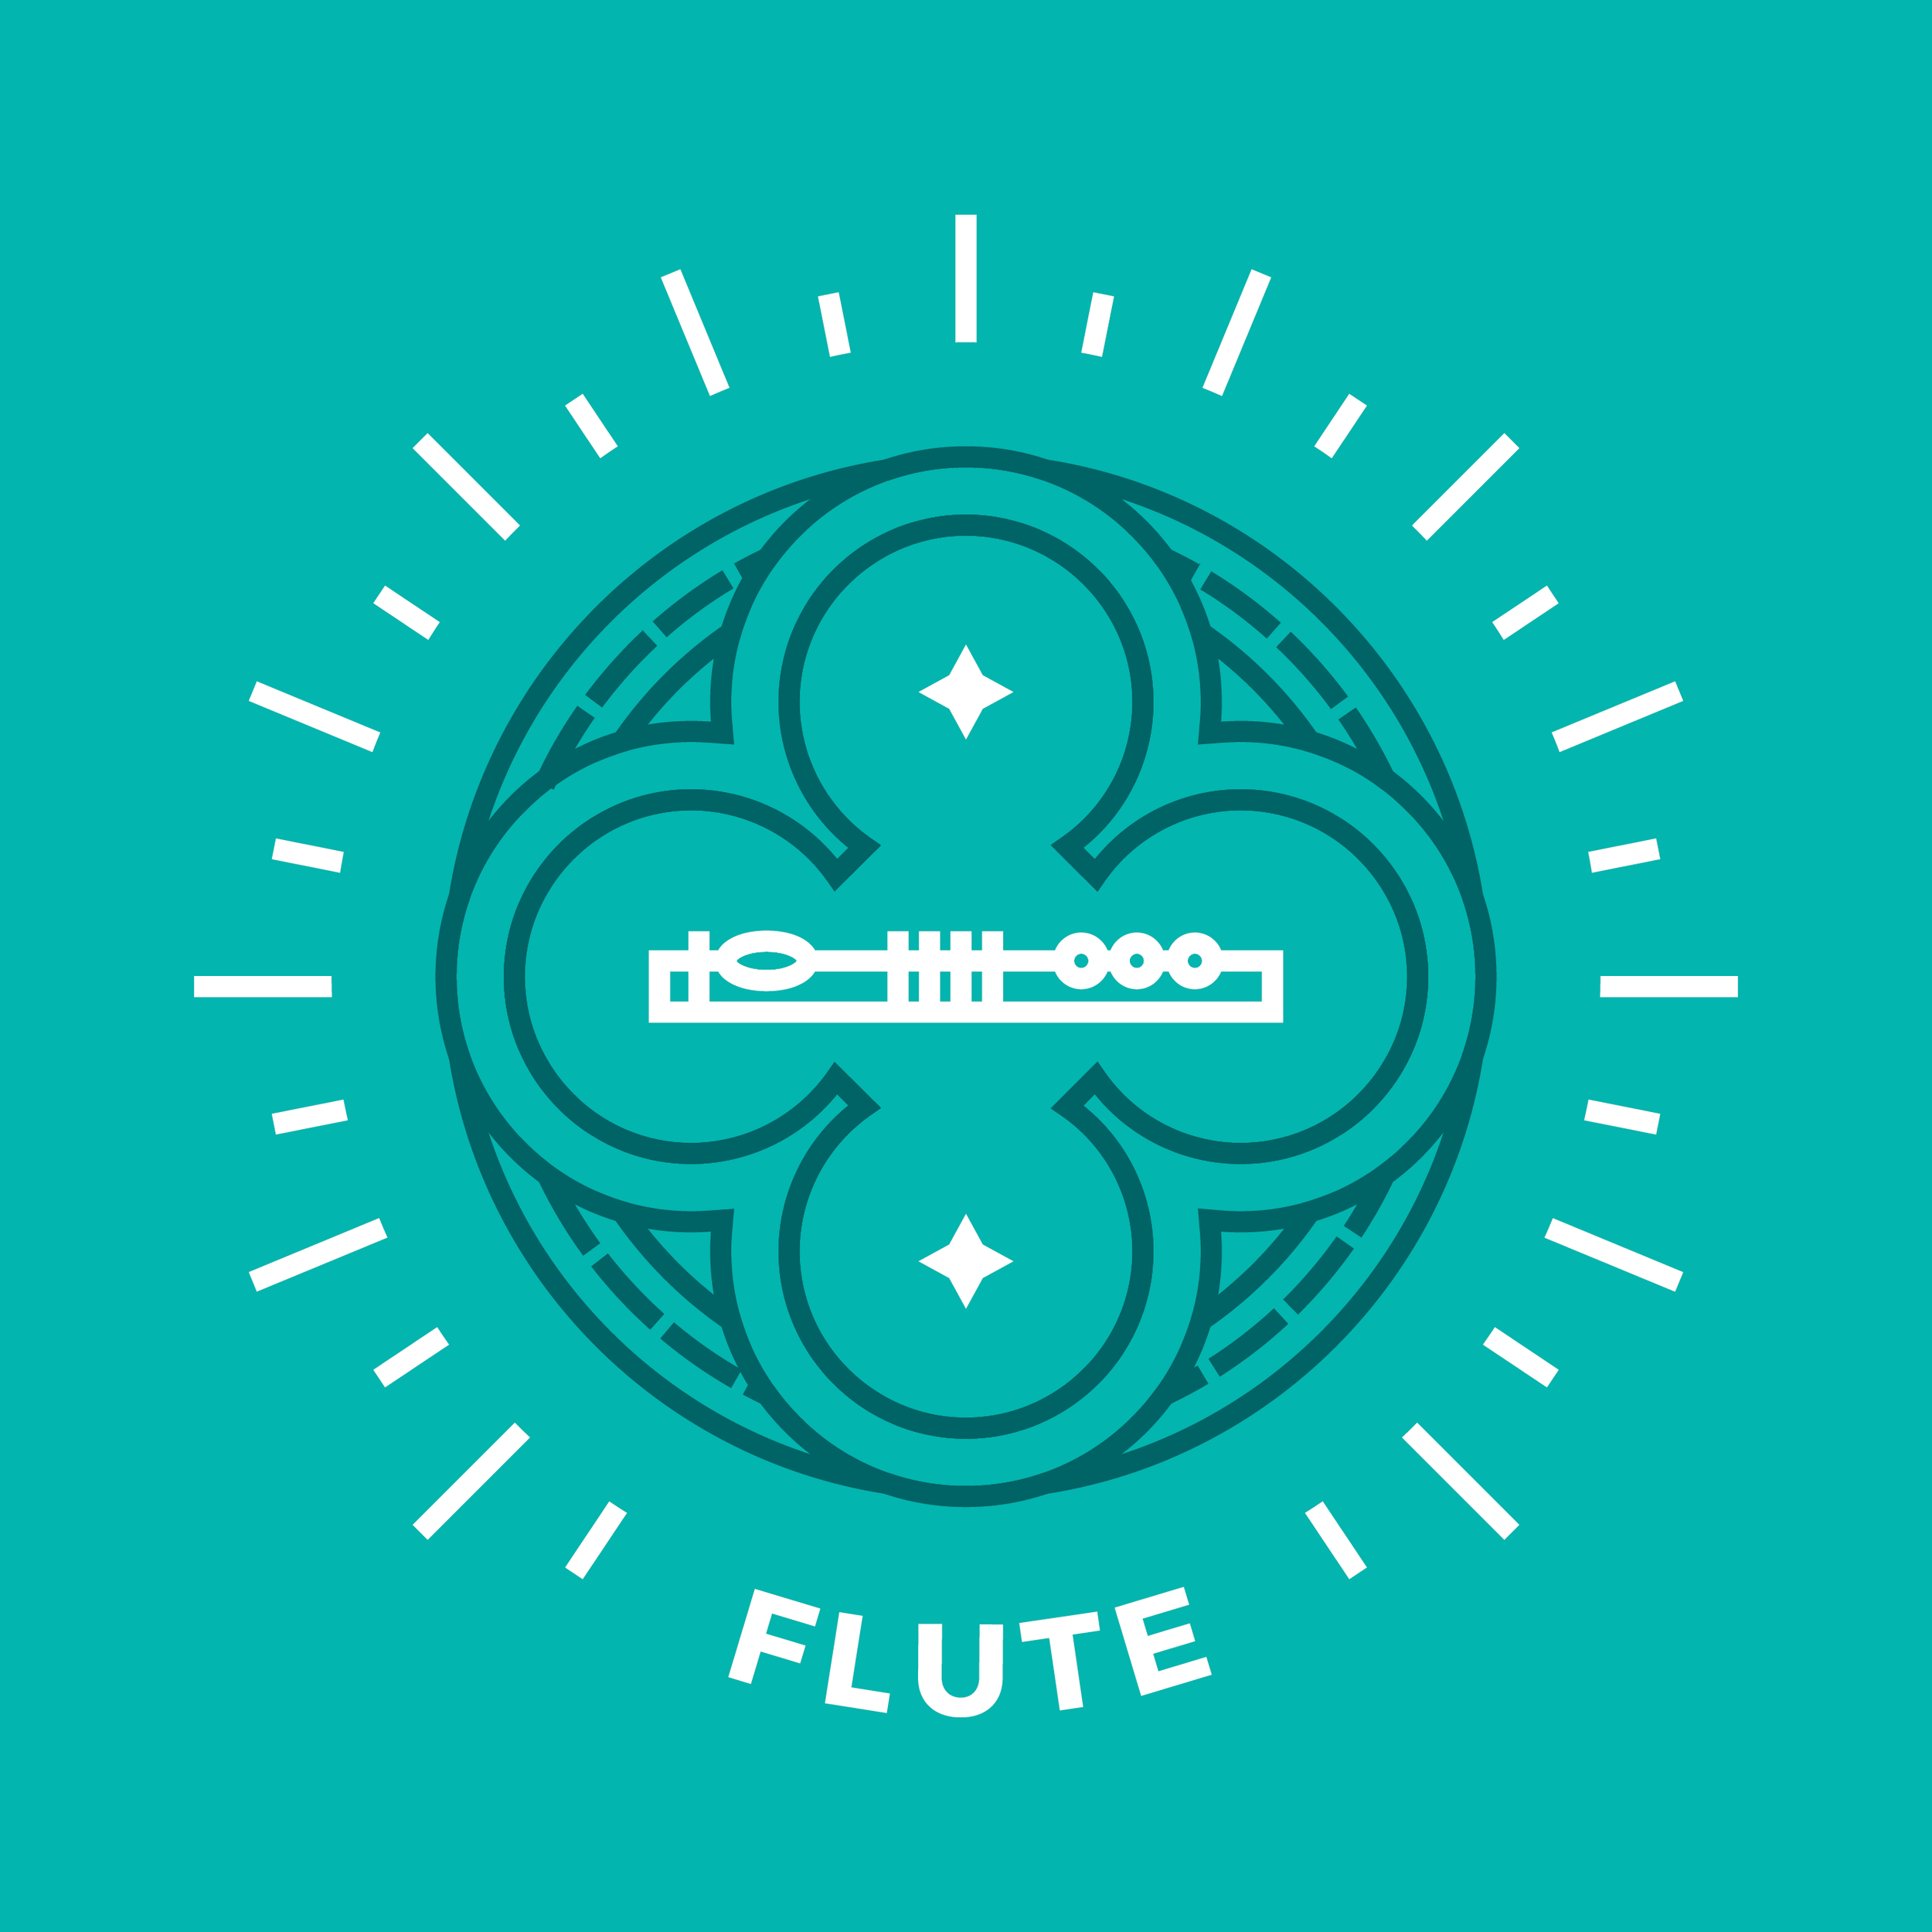 Flute-01.png